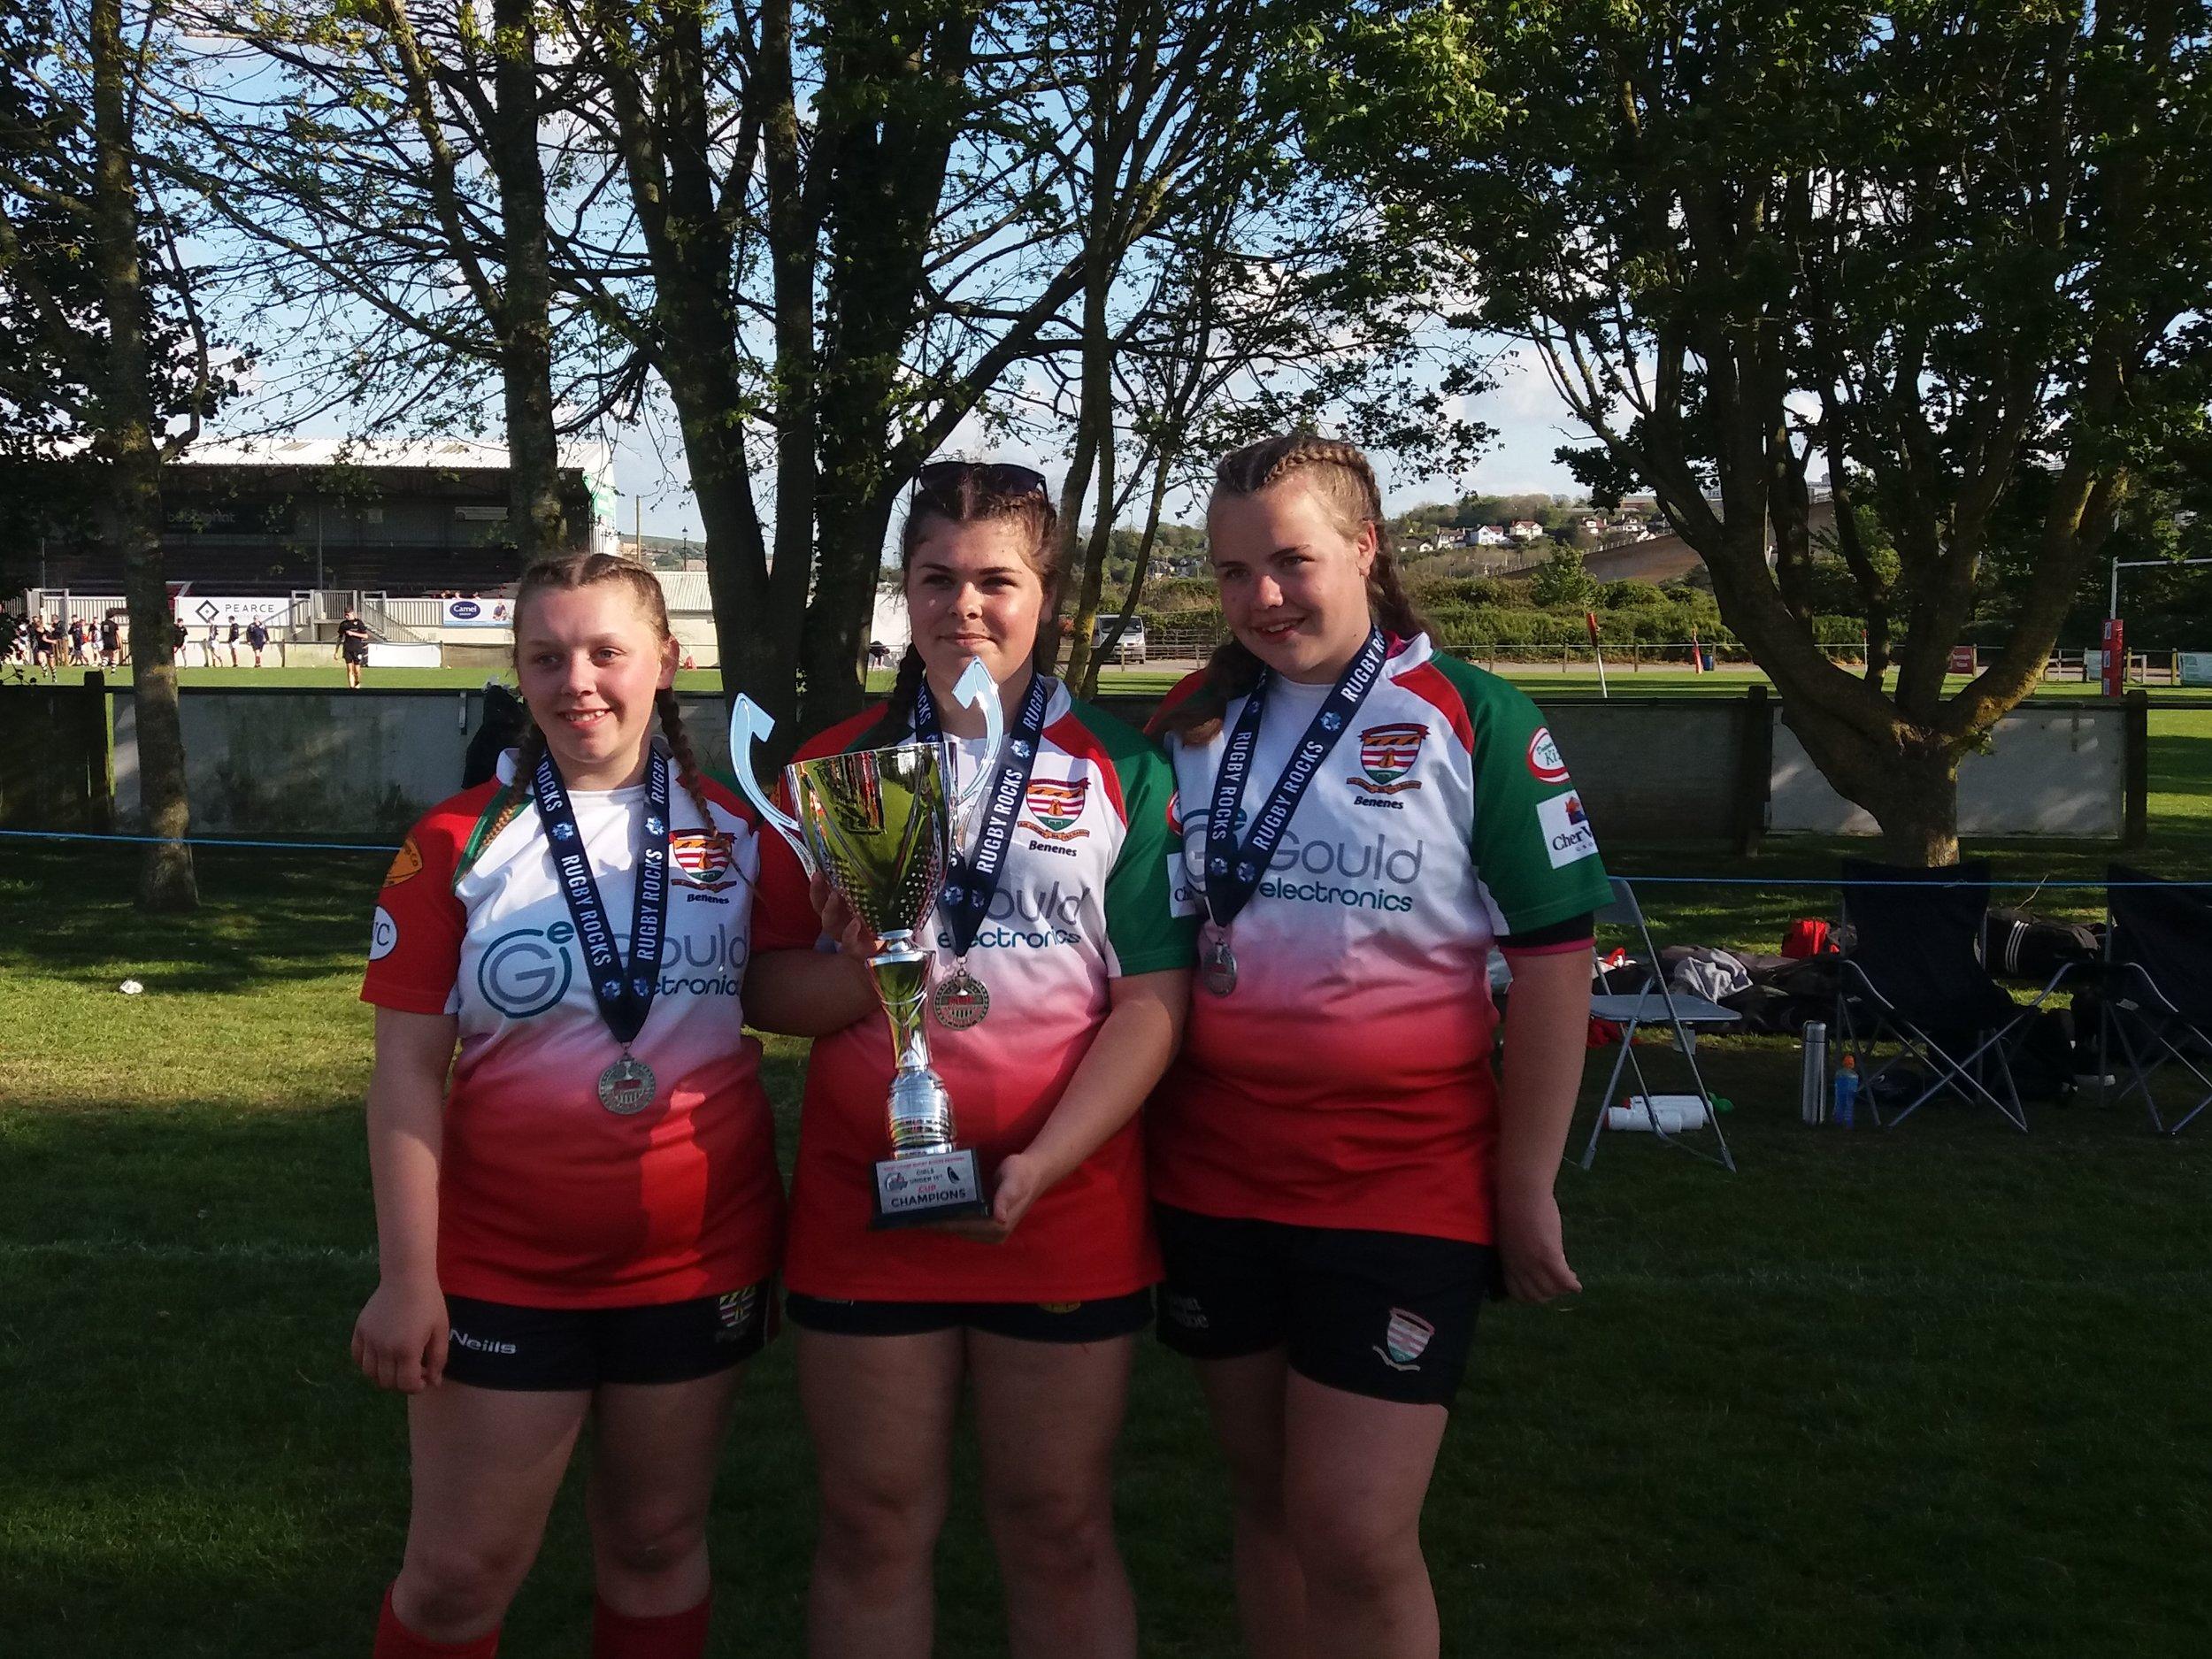 rugbygirlswin.jpg